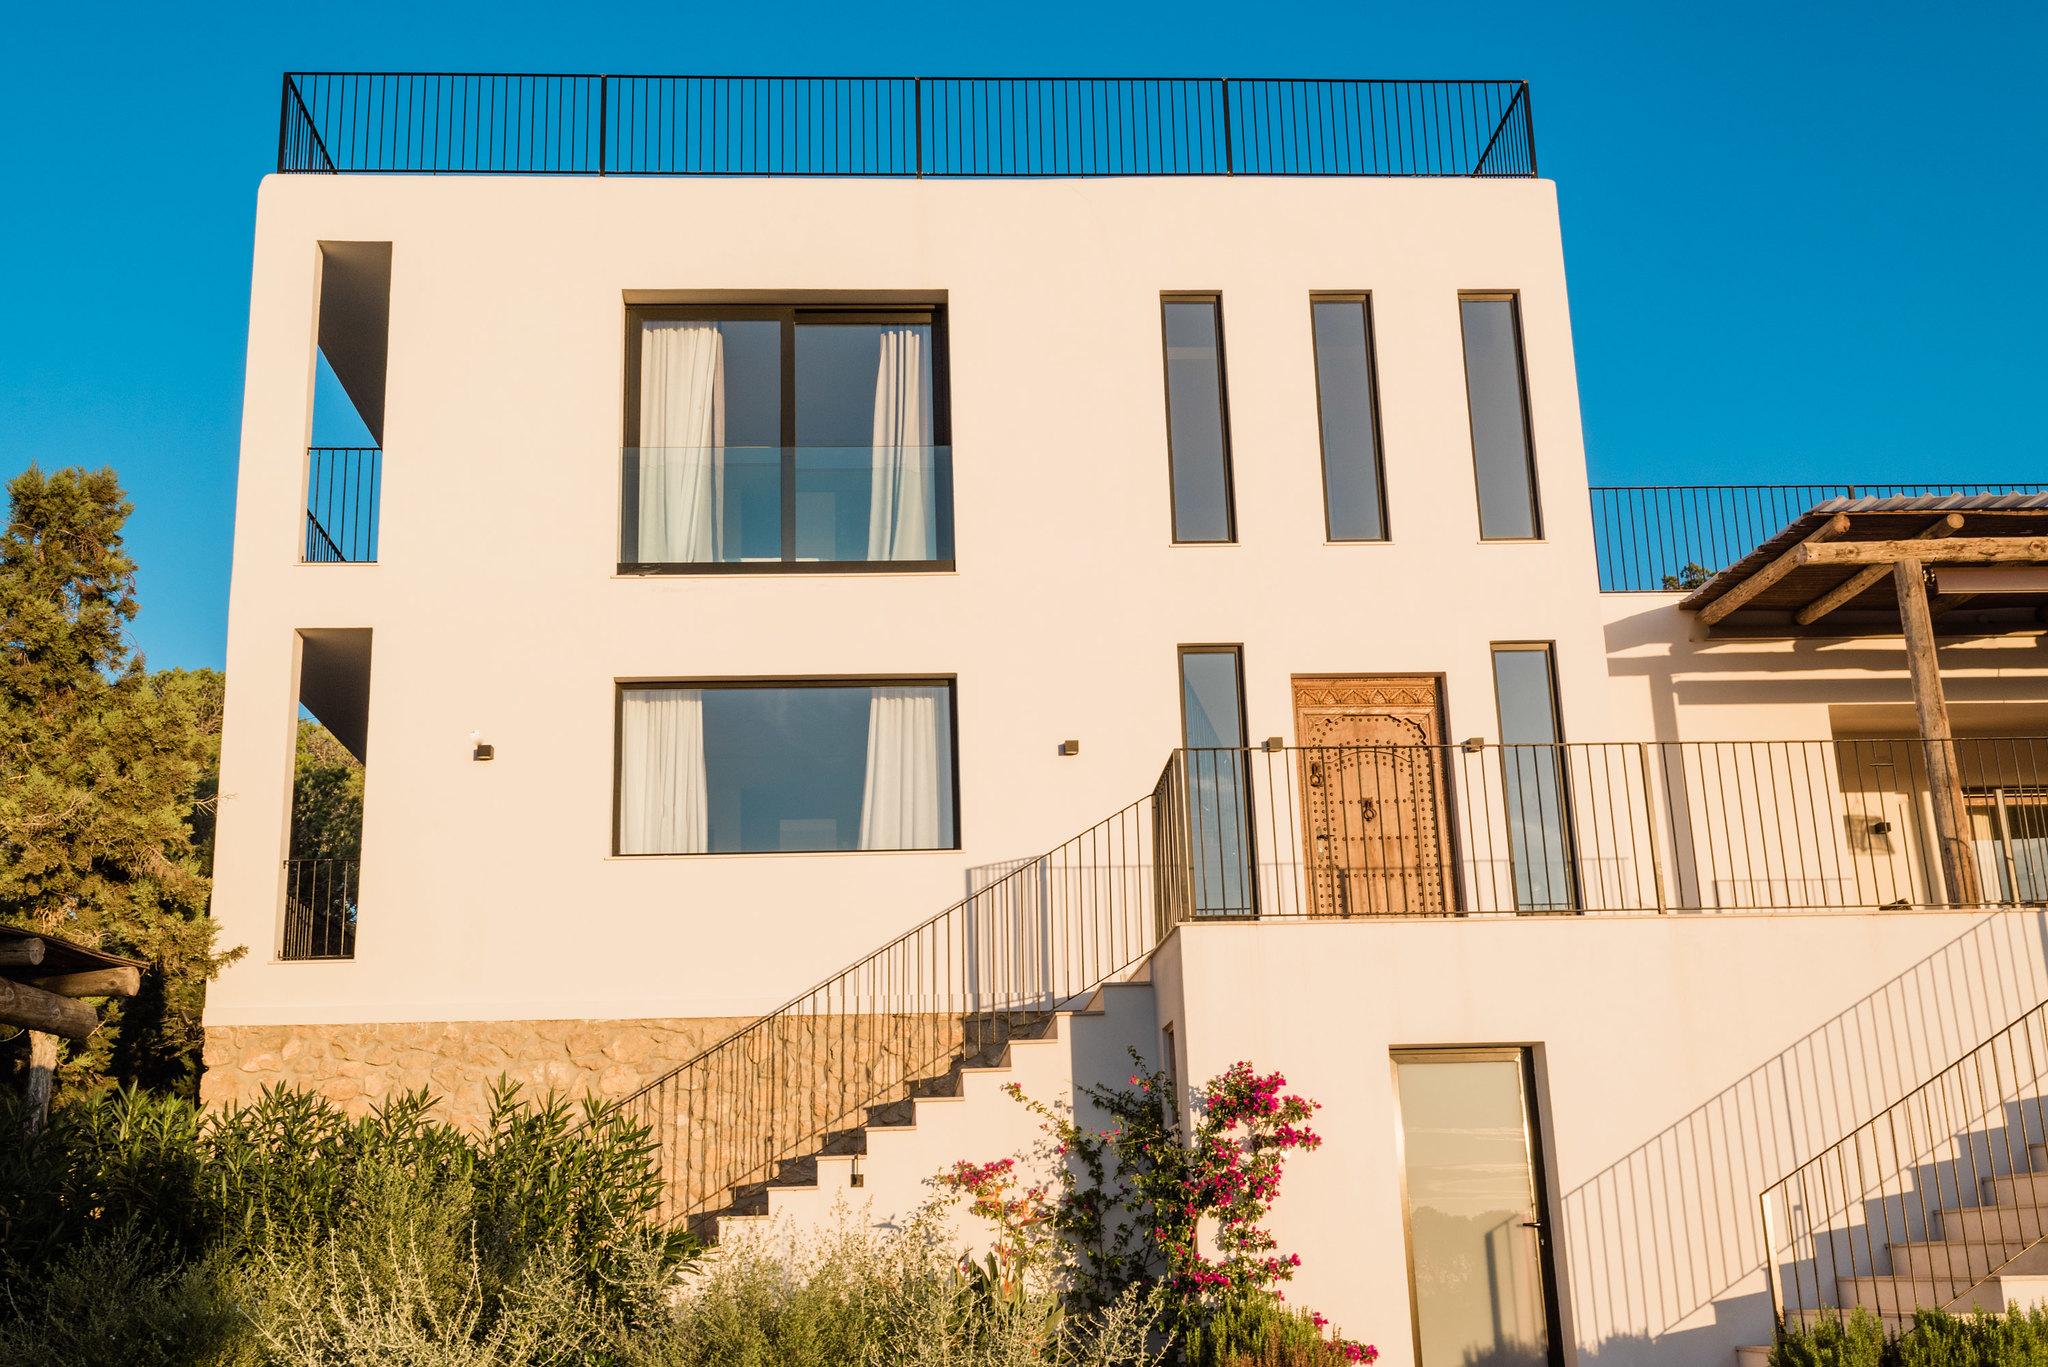 https://www.white-ibiza.com/wp-content/uploads/2020/06/white-ibiza-villas-sa-serra-exterior-facade.jpg